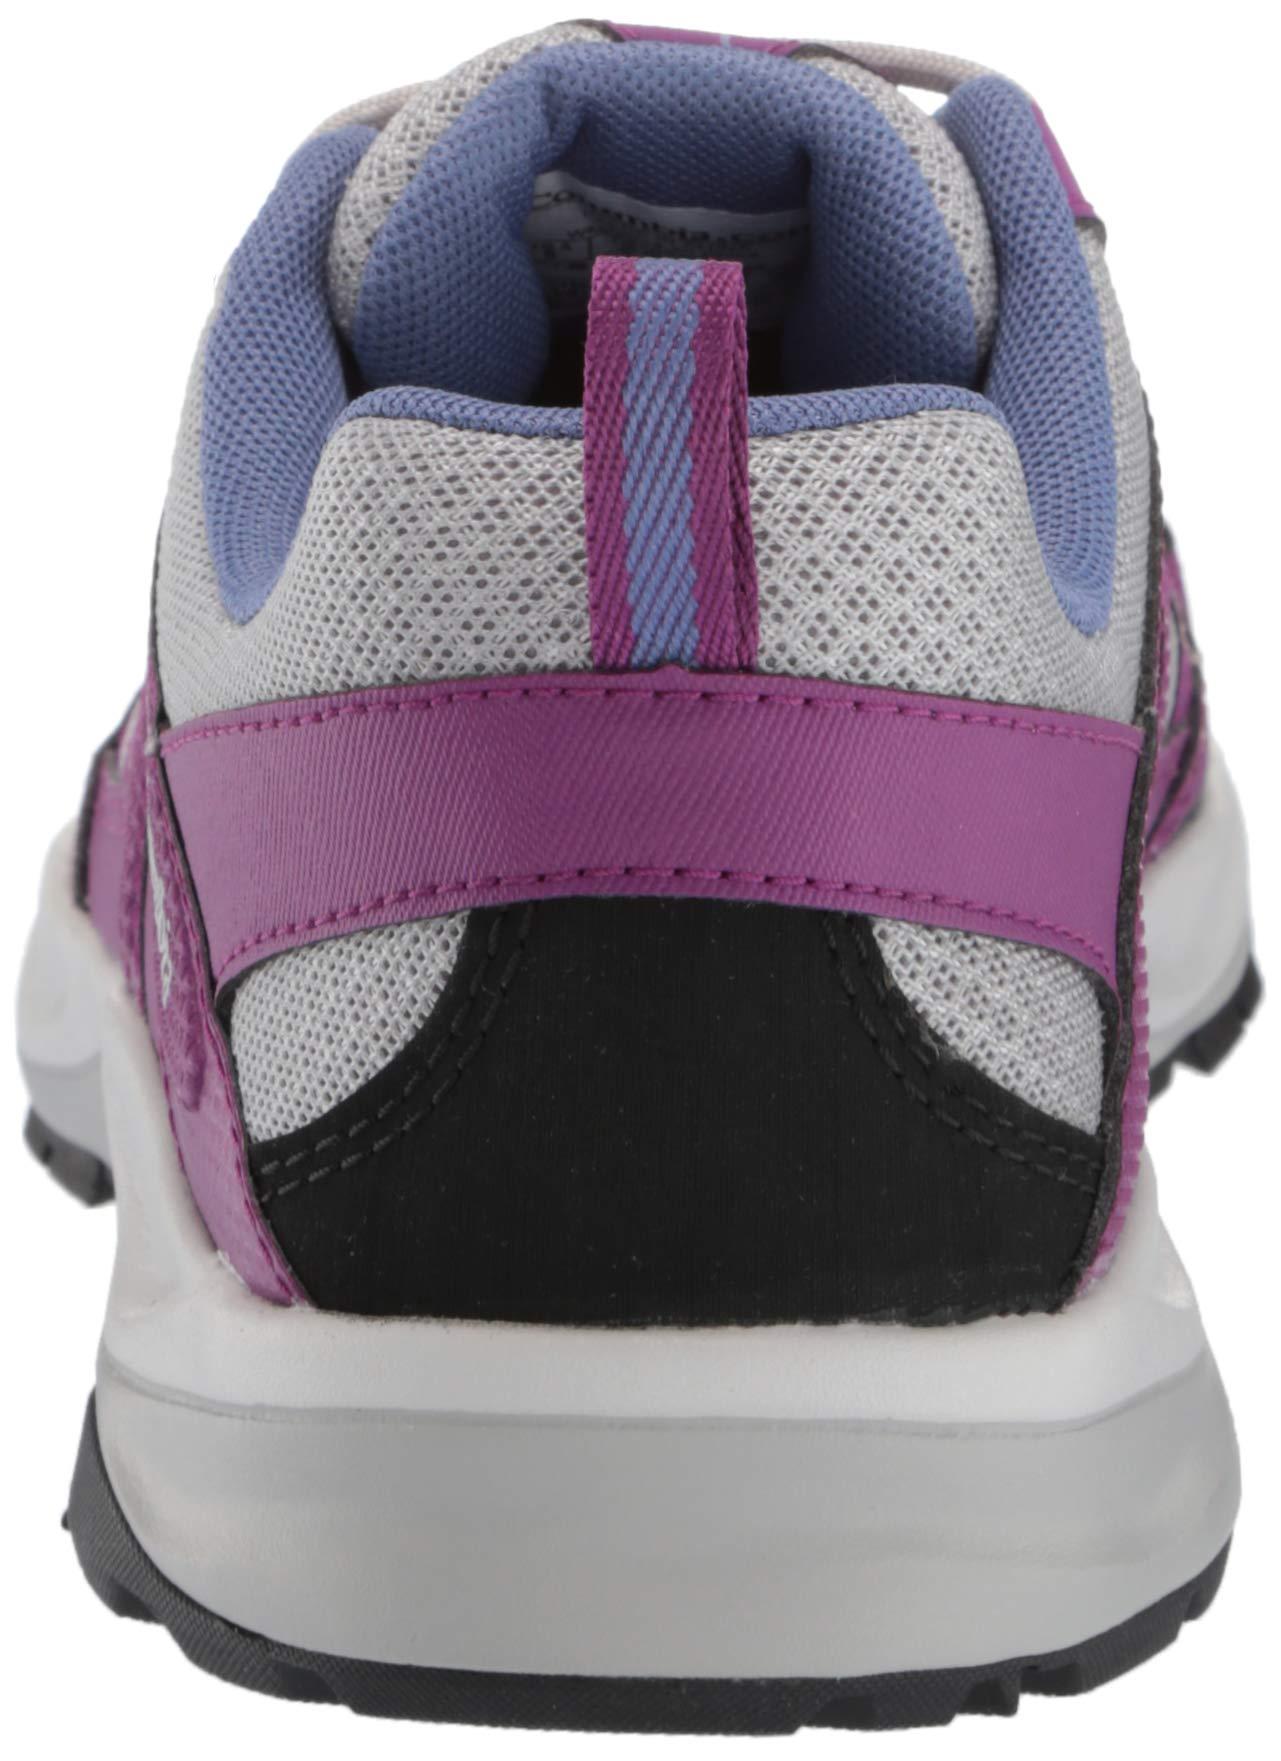 71O5YnW2H0L - Columbia Women's WAYFINDER Hiking Shoes